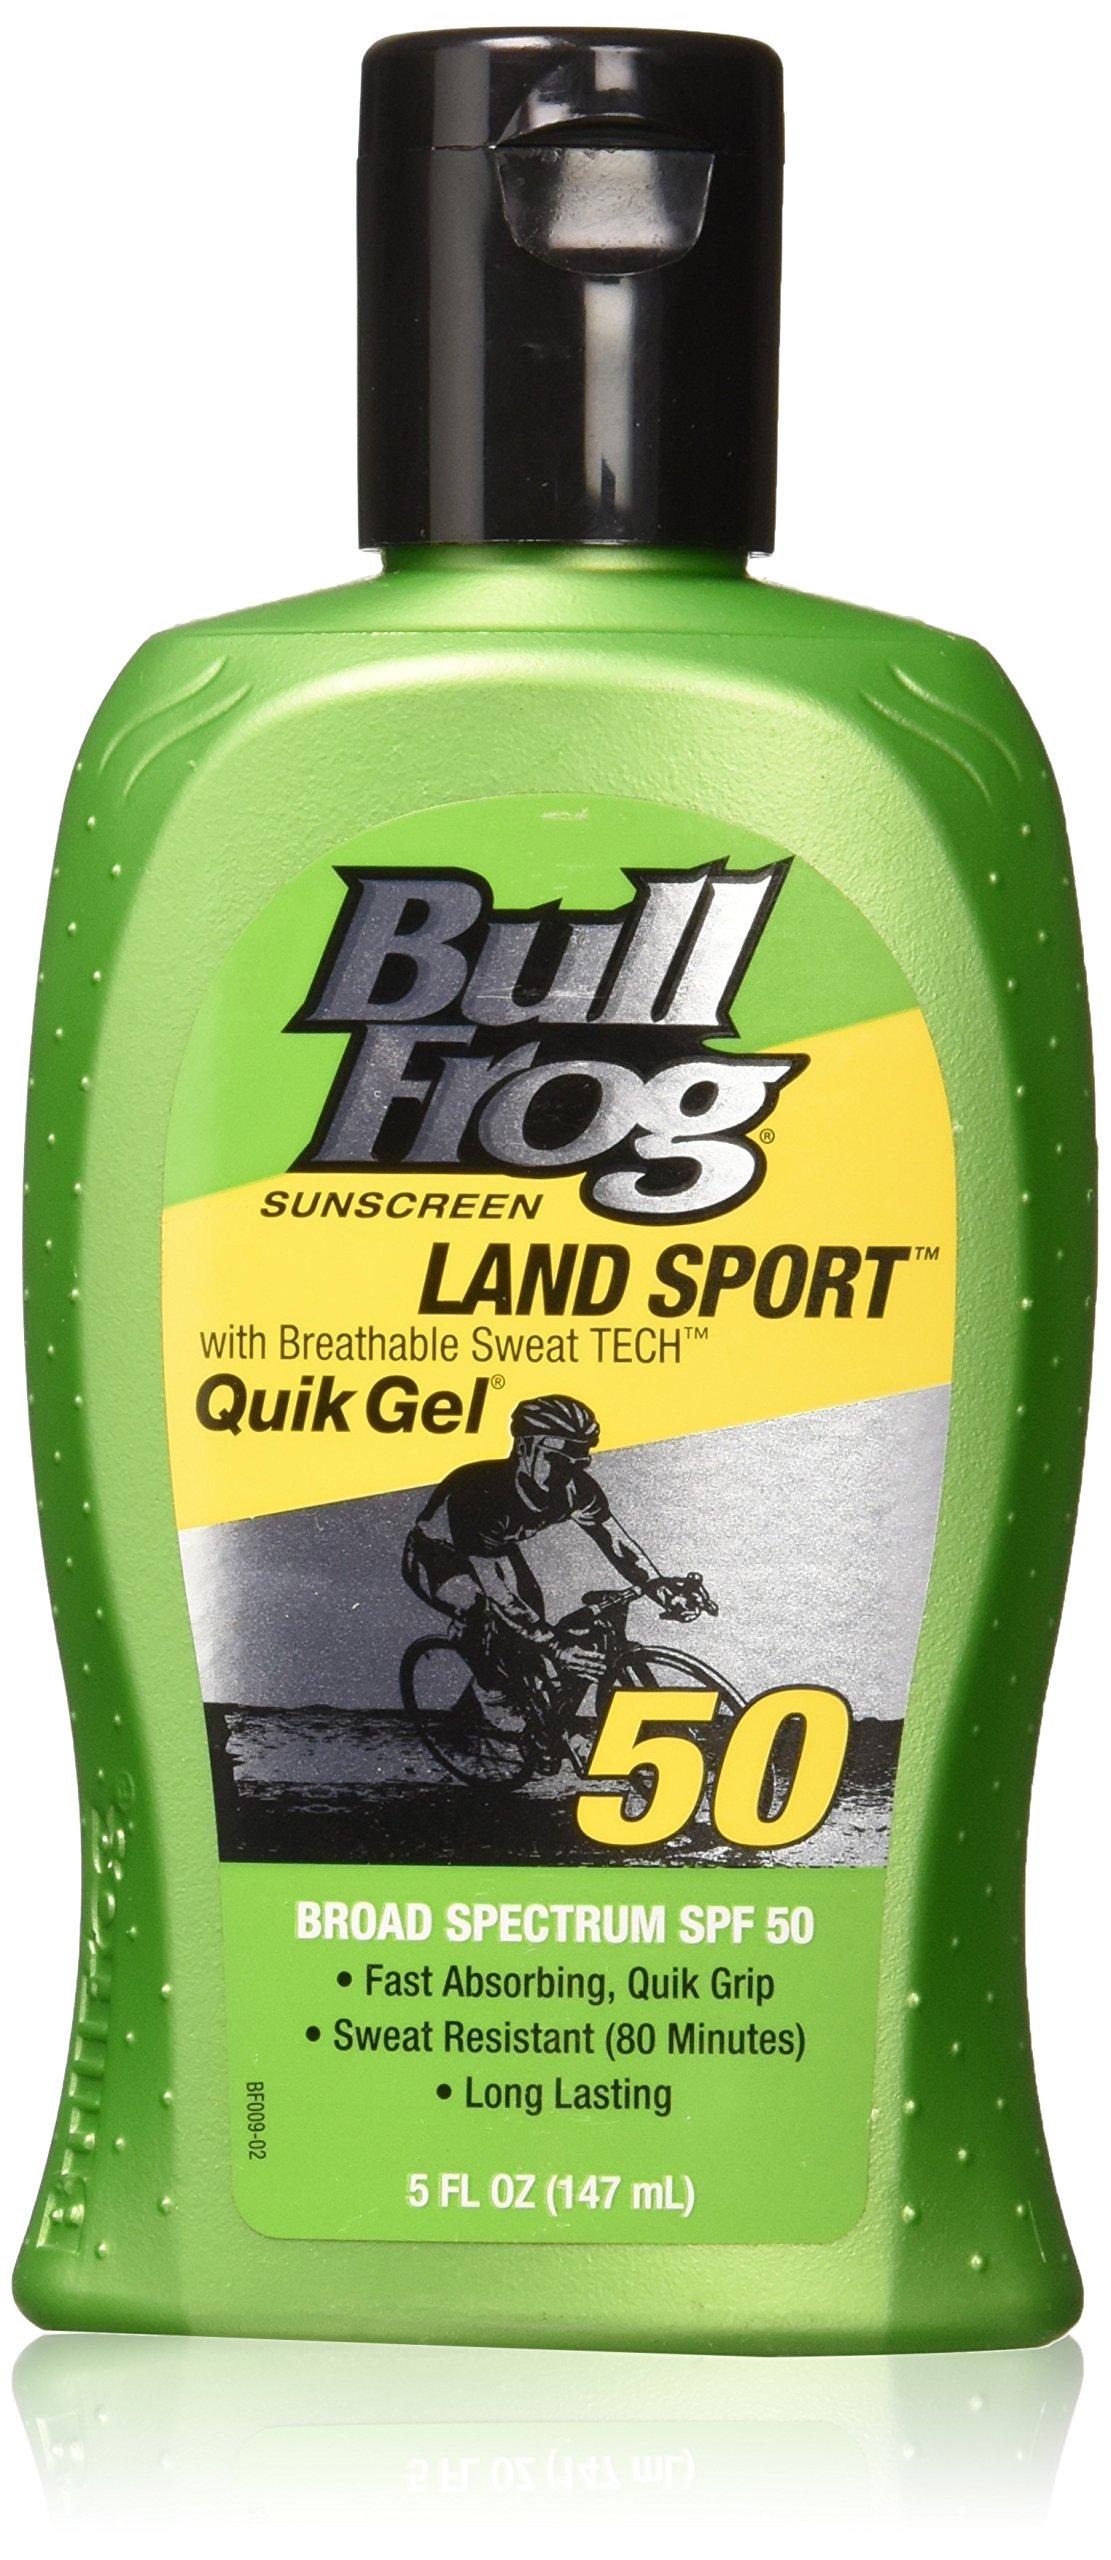 BullFrog Land Sport, Quik Gel Sunscreen SPF 50 (Pack of 2)